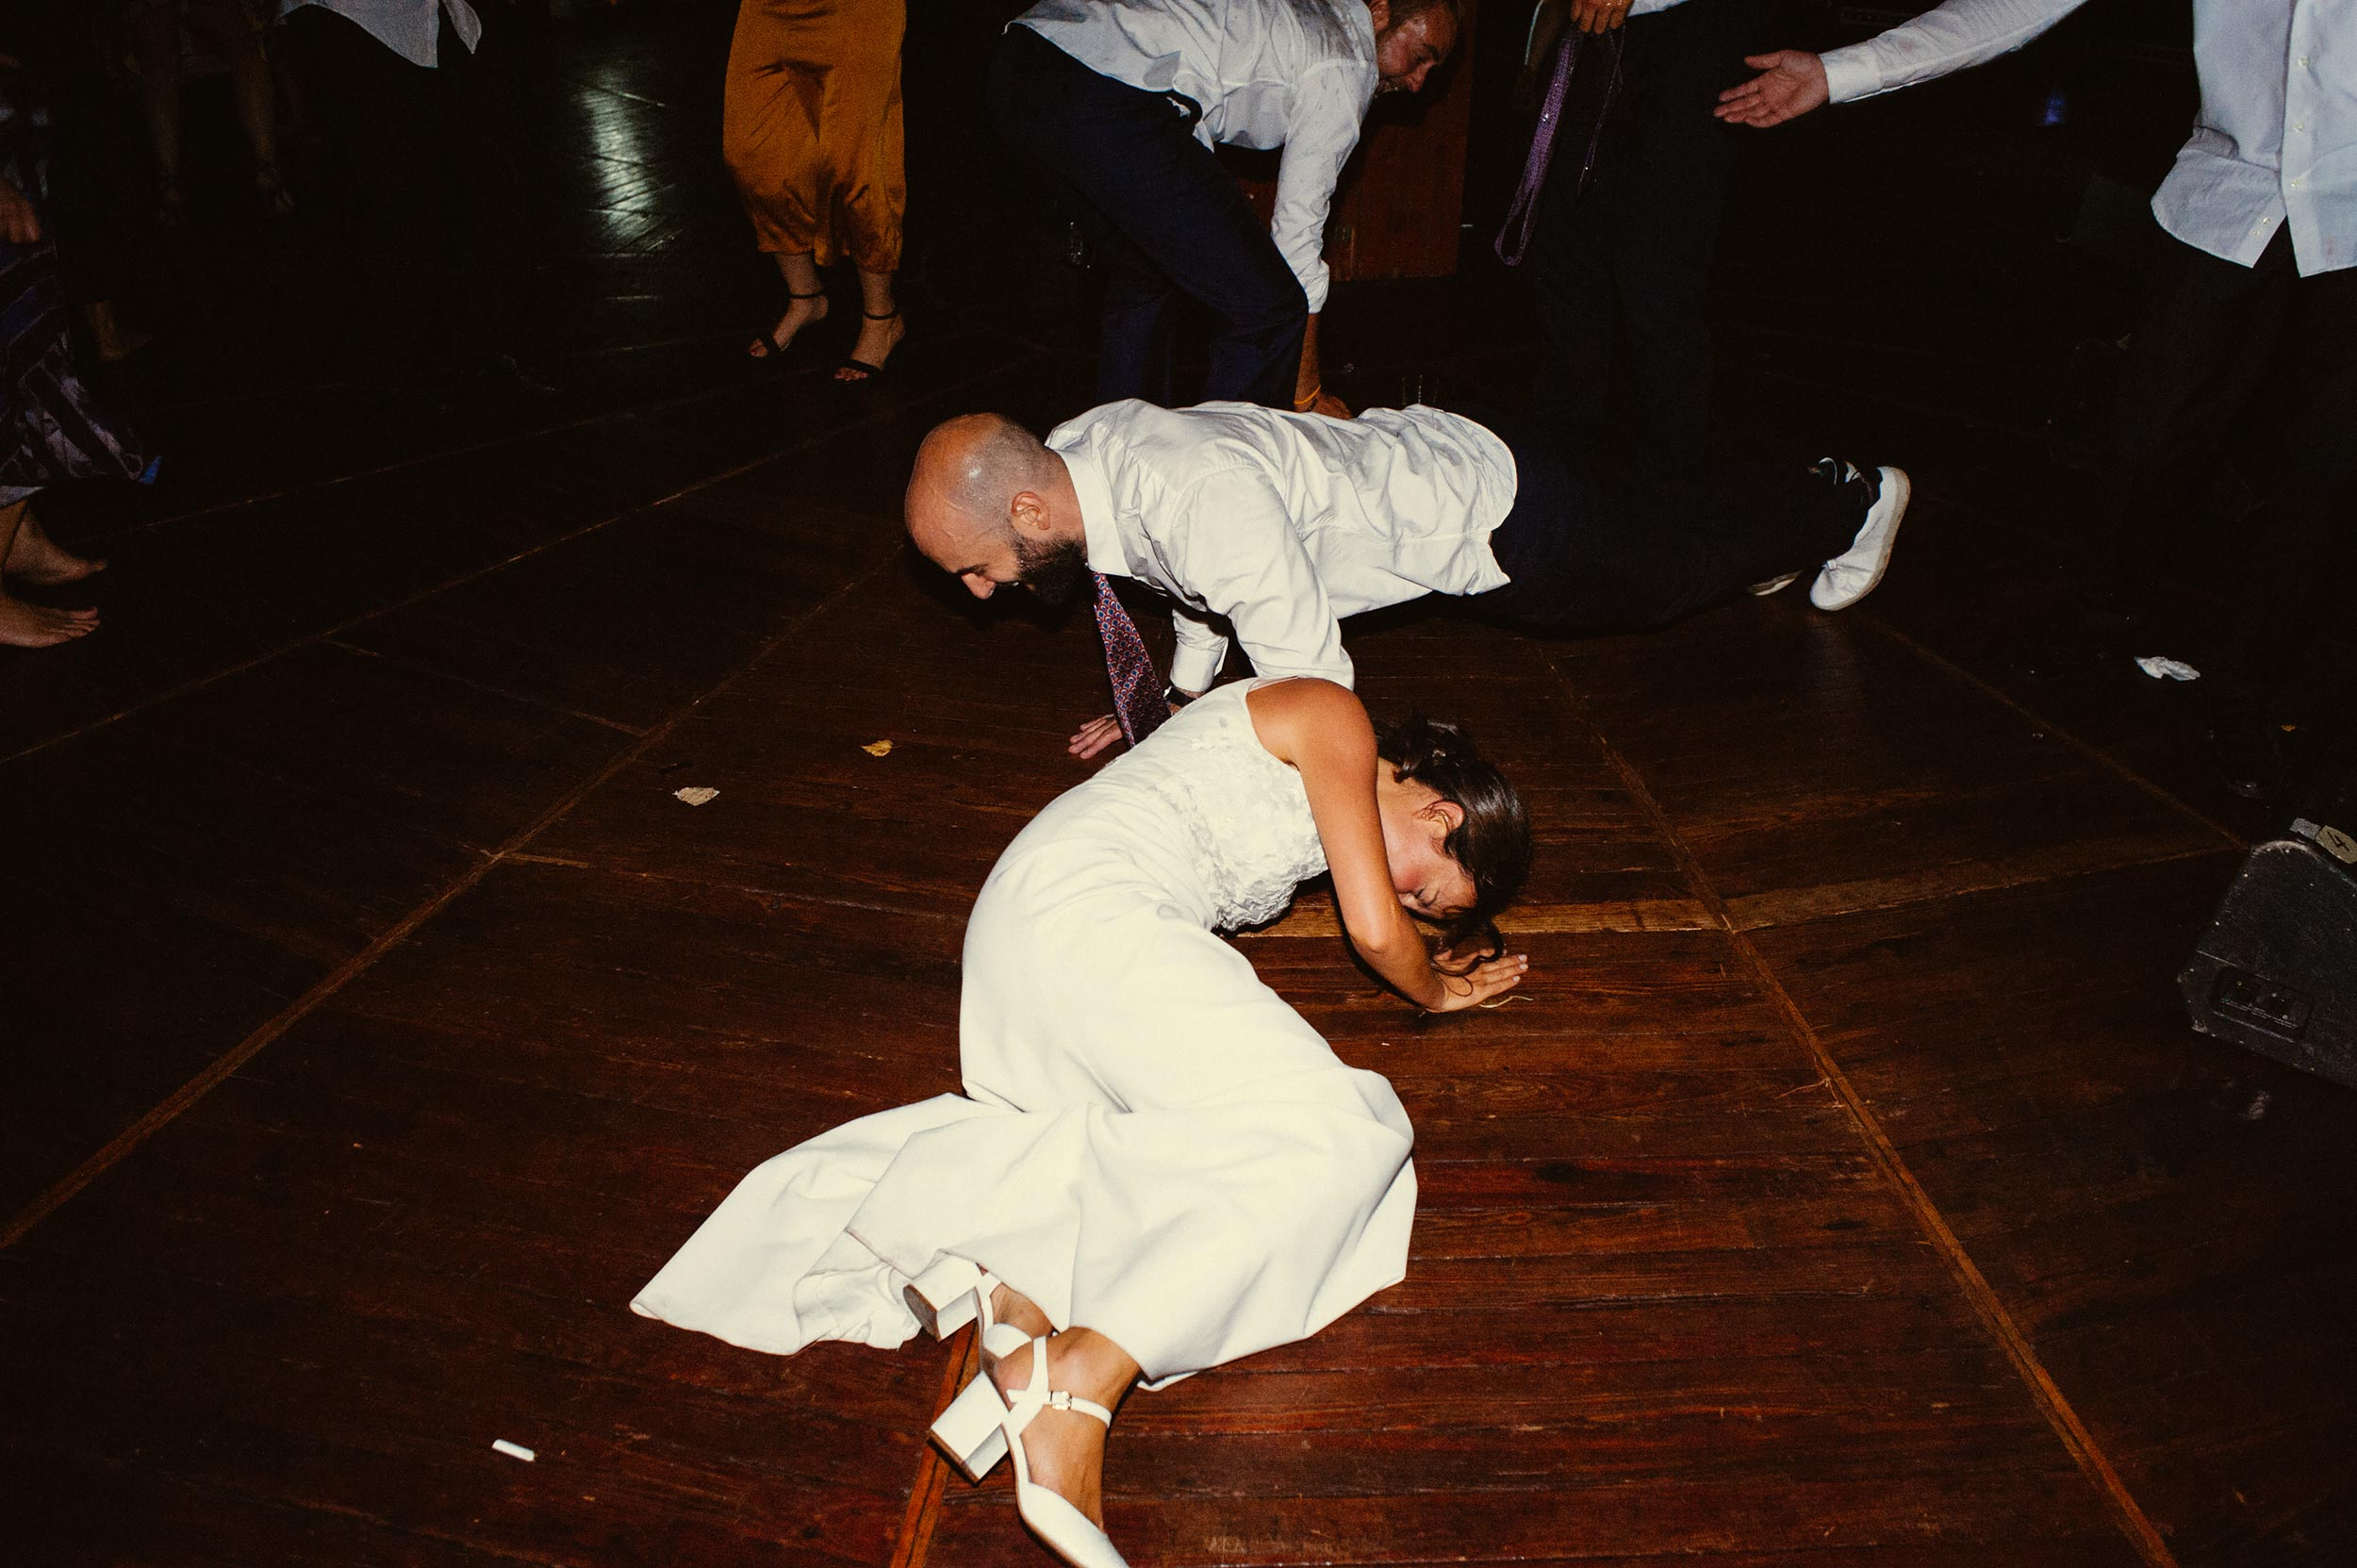 2016-Davor-Chiara-Monferrato-Asti-Vercelli-Wedding-Photographer-Italy-Alessandro-Avenali-134.jpg